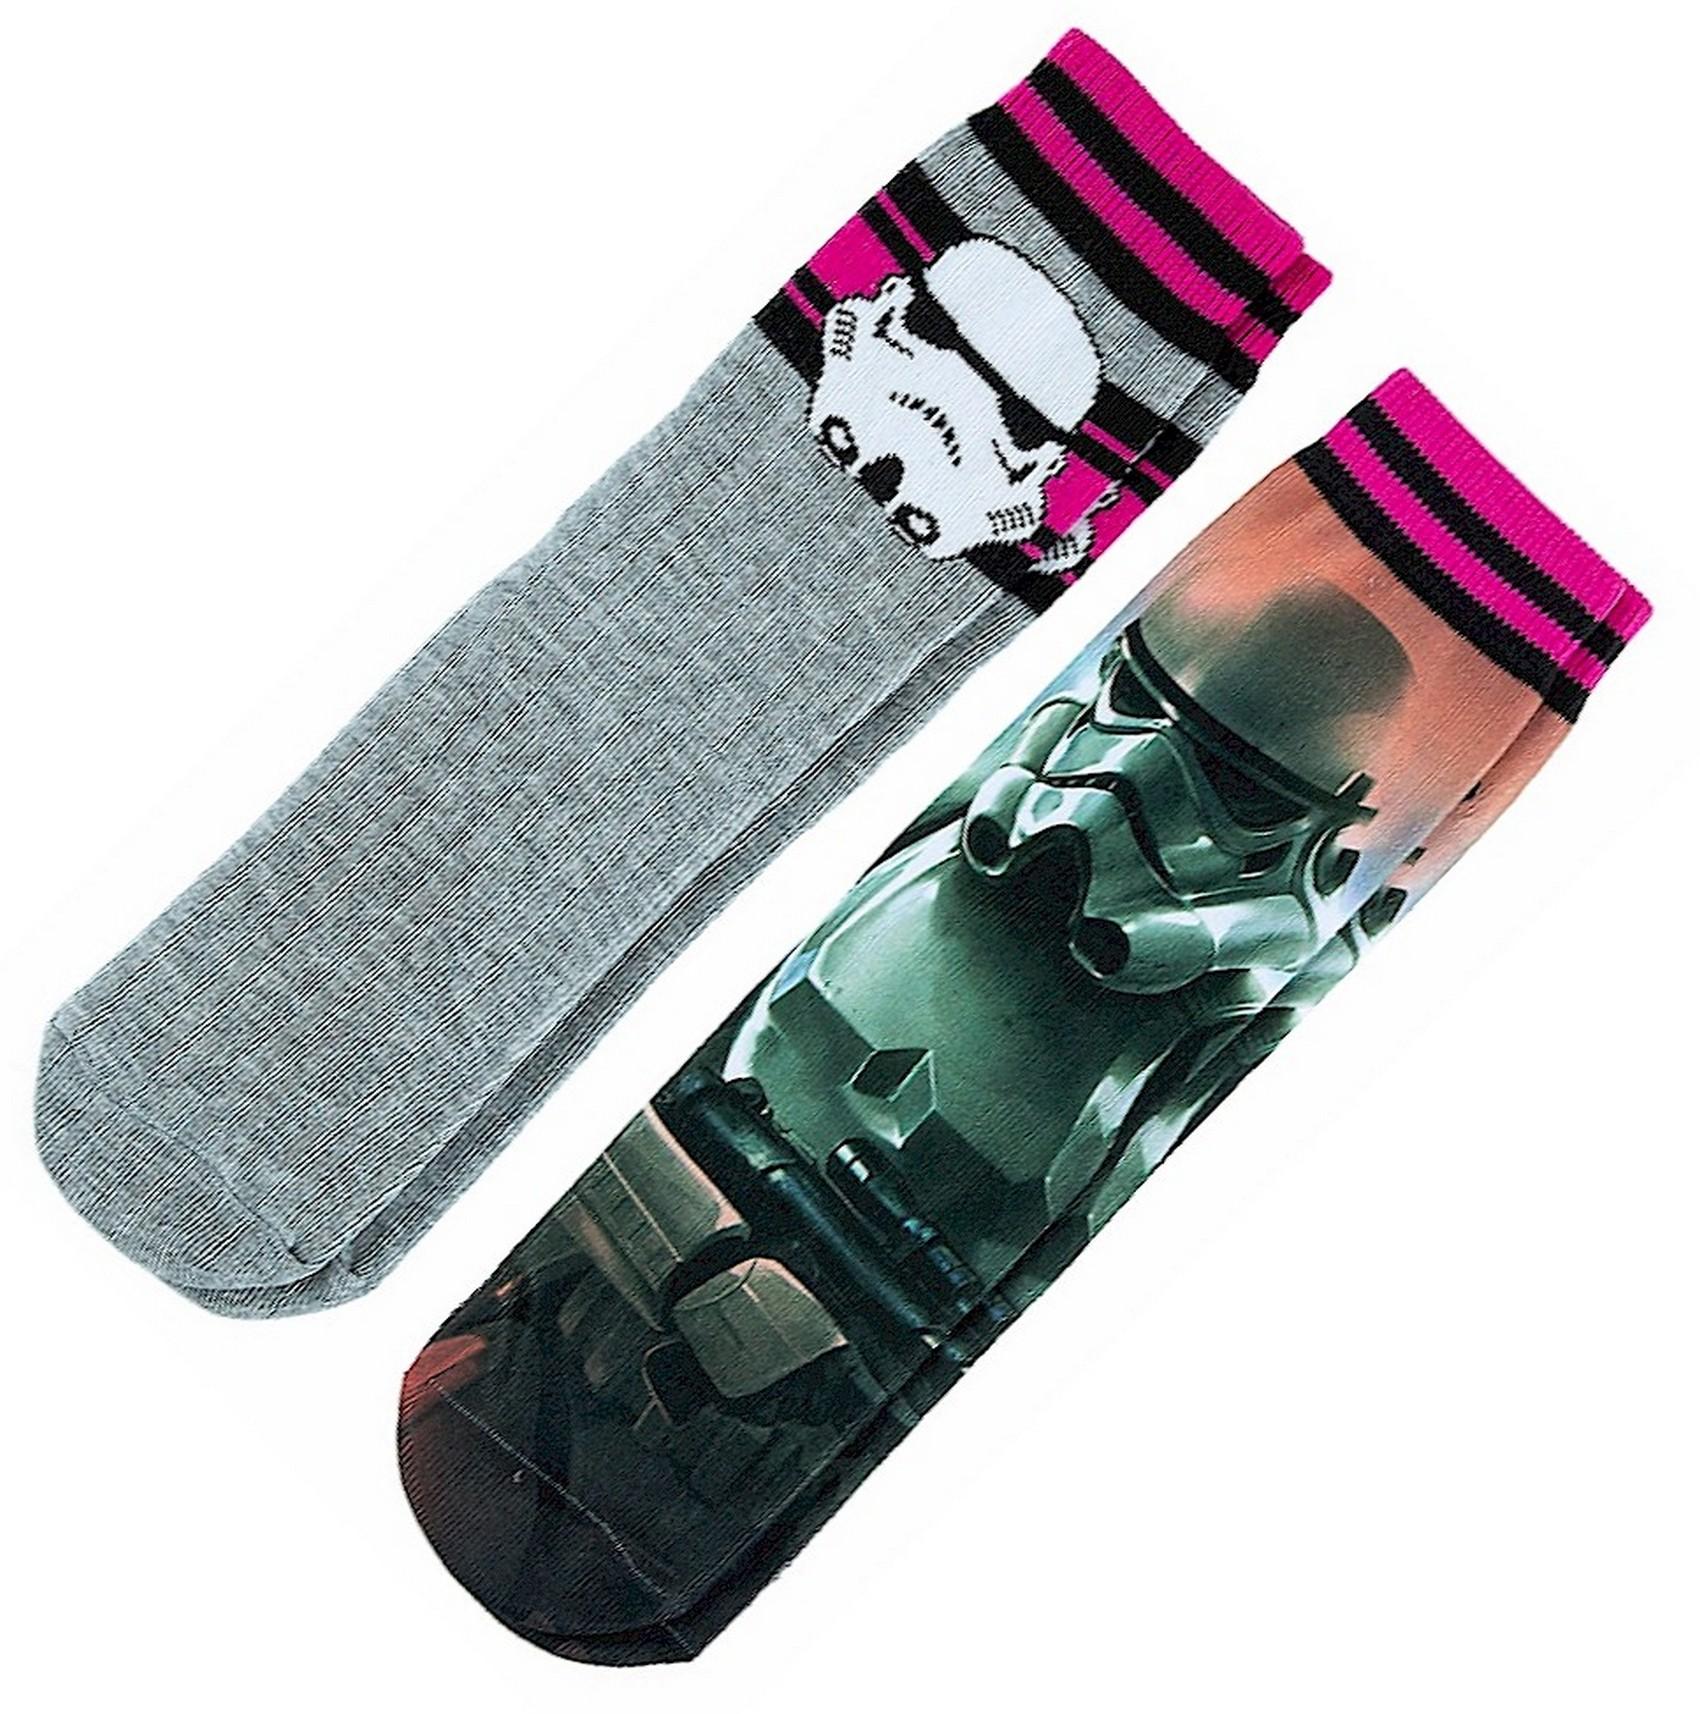 Stormtrooper Set of 2 Adult Socks ~ Disney Star Wars